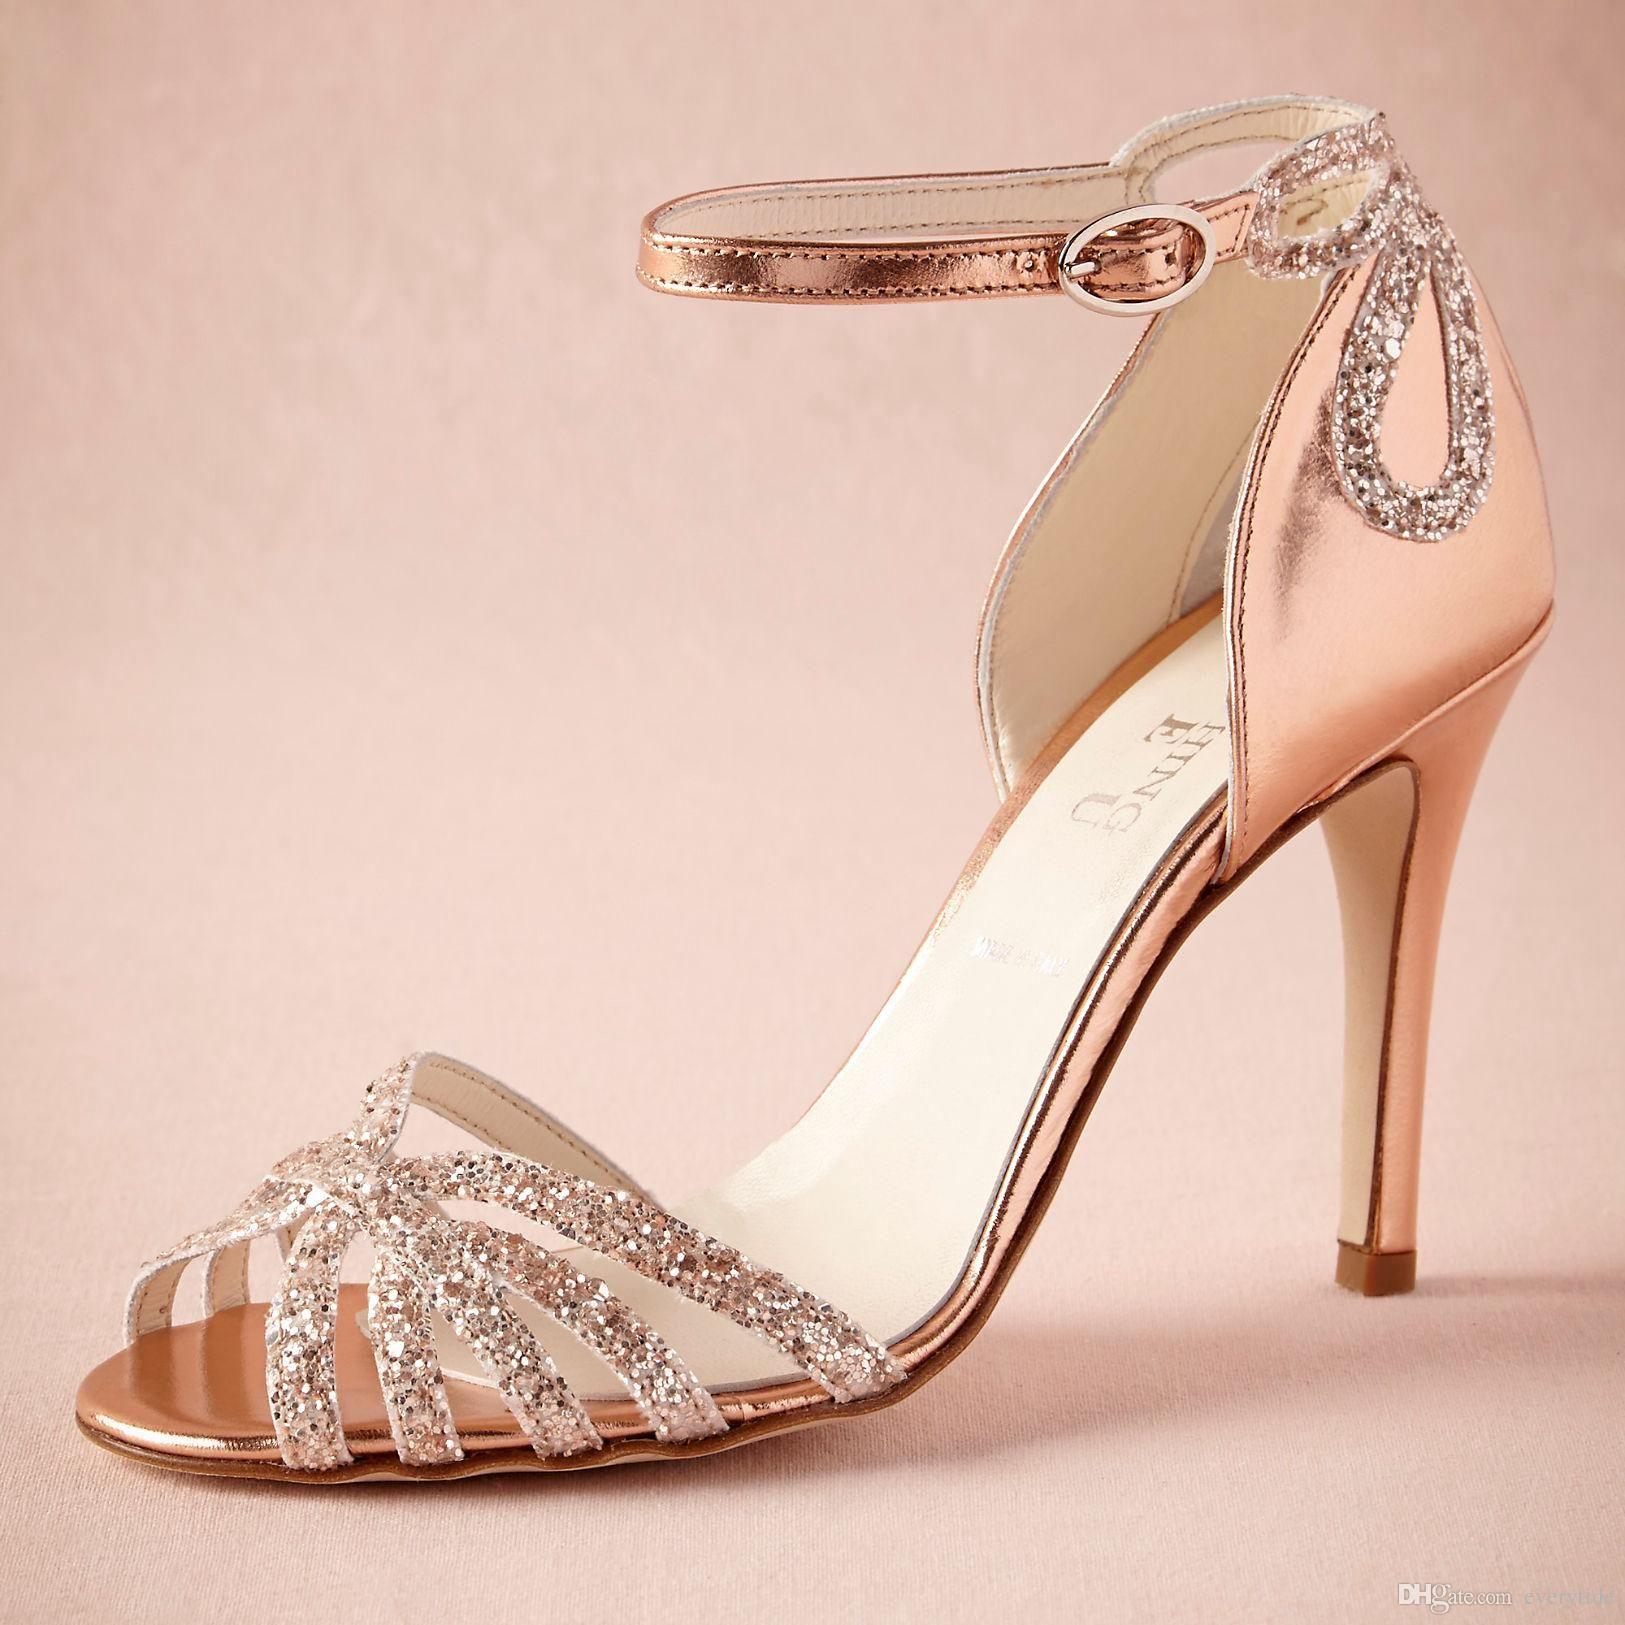 2015 Stunning Wedding Shoes High Heels Medium Length Women Shoes Open Toe  Thin Heels Women Shoes